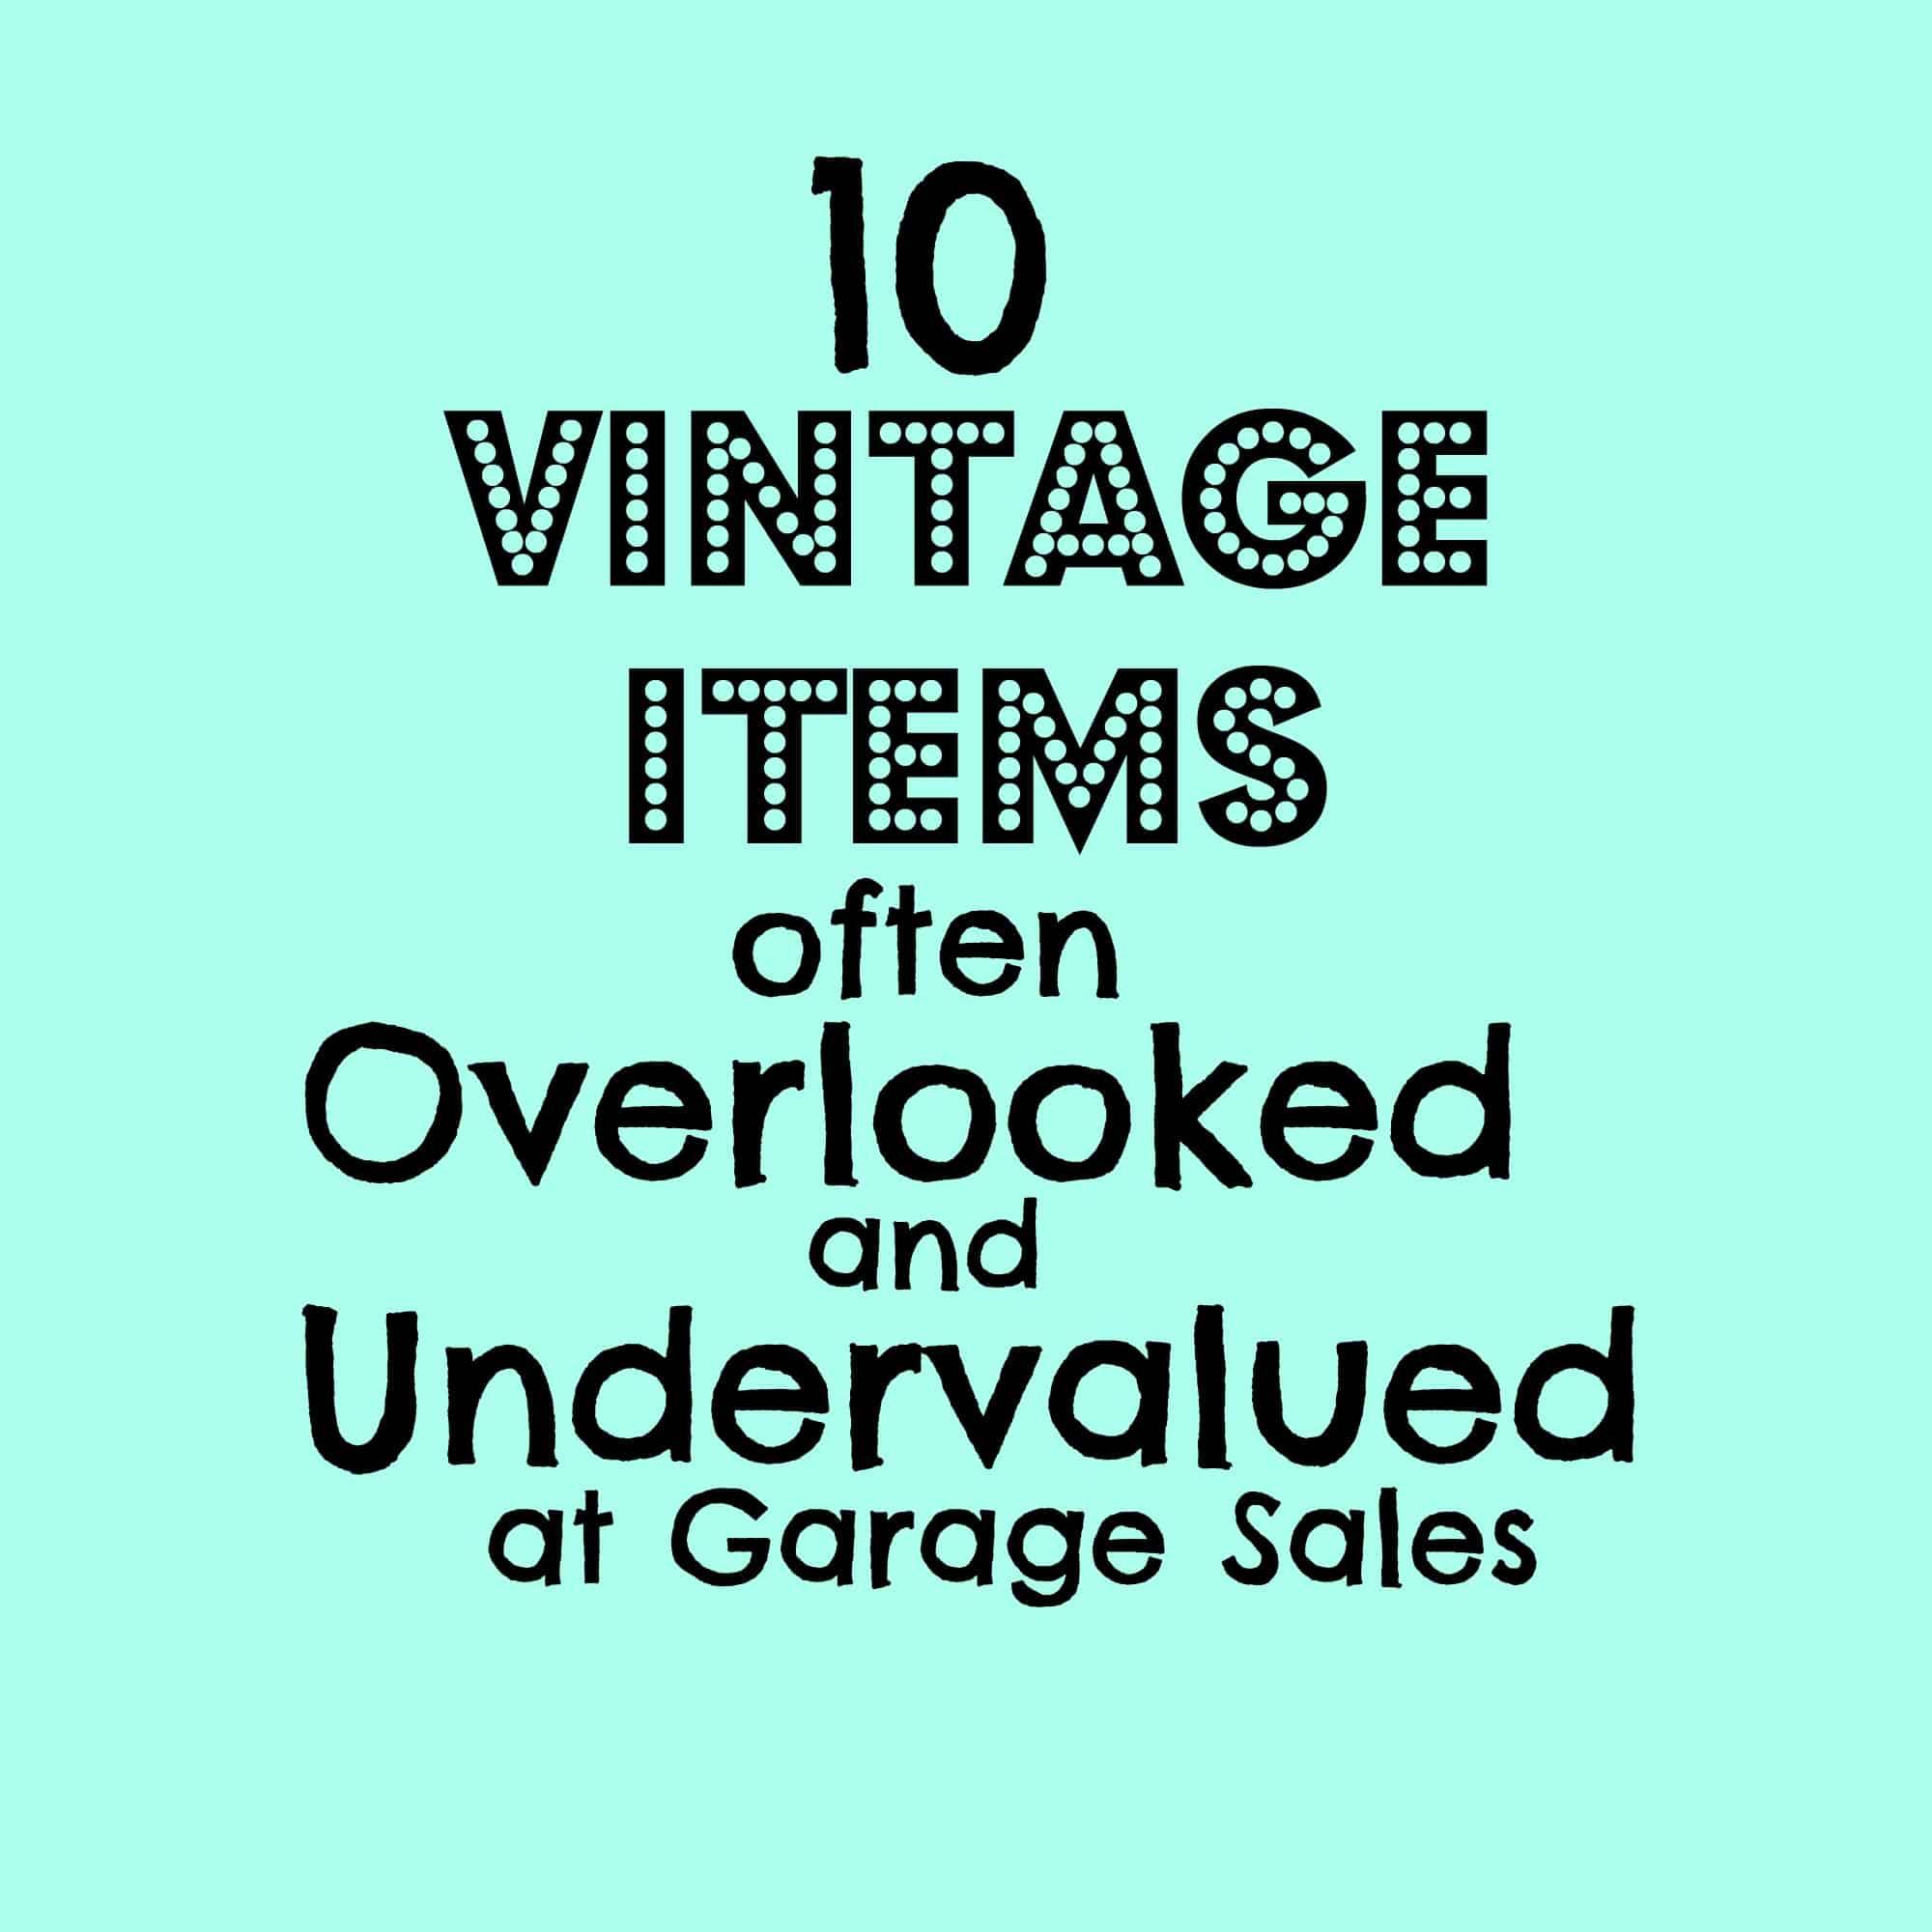 10 Vintage Items Often Overlooked Amp Undervalued At Garage